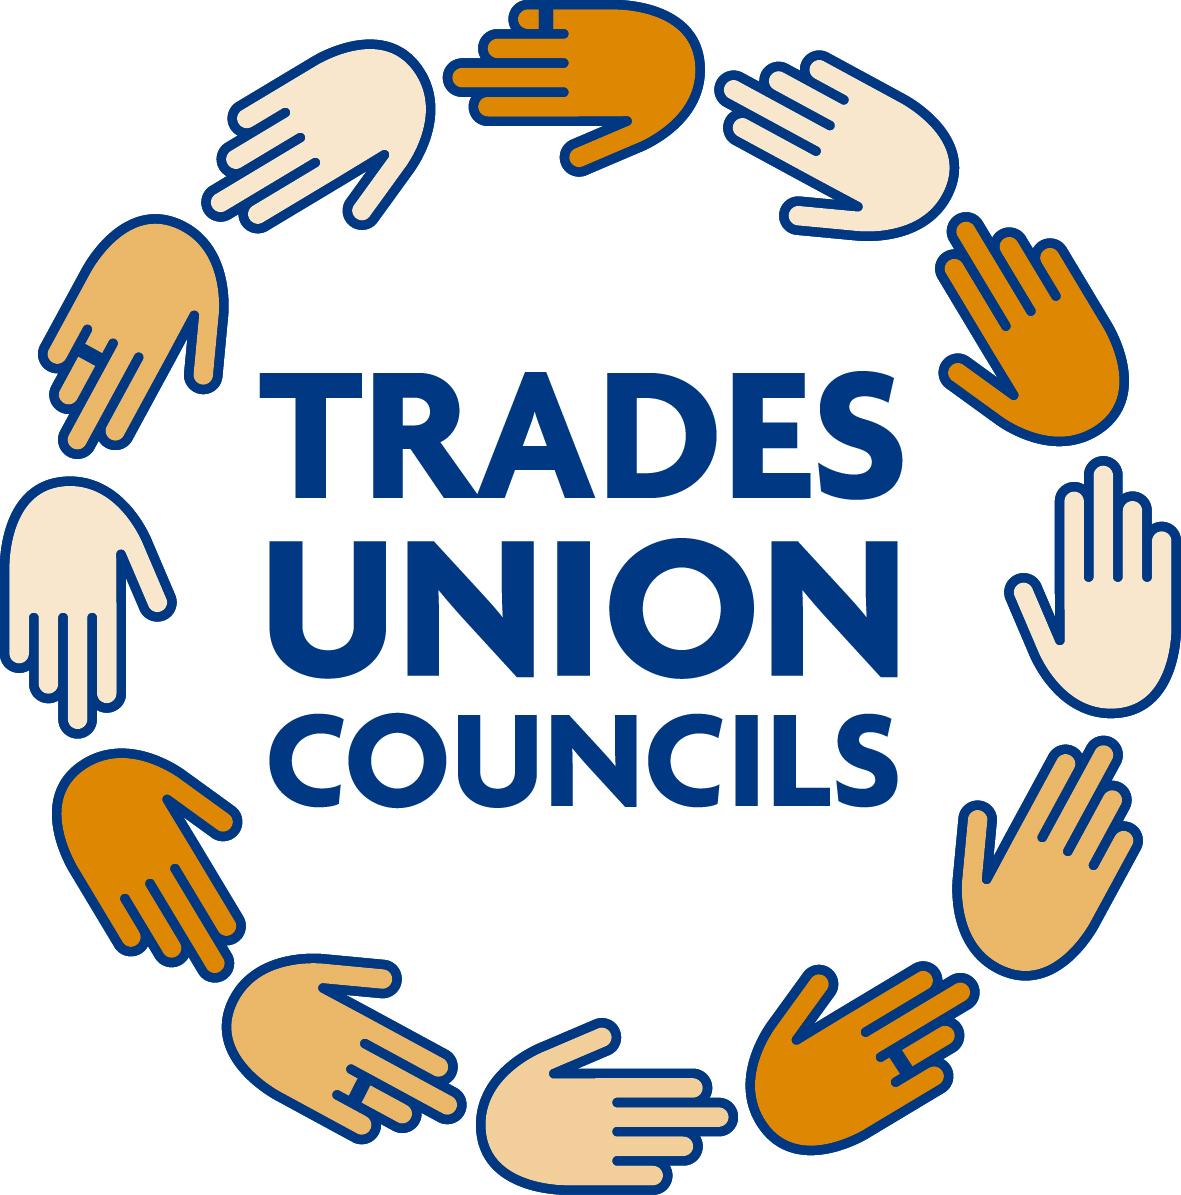 Trades_Union_Councils_logo_RGB.jpg